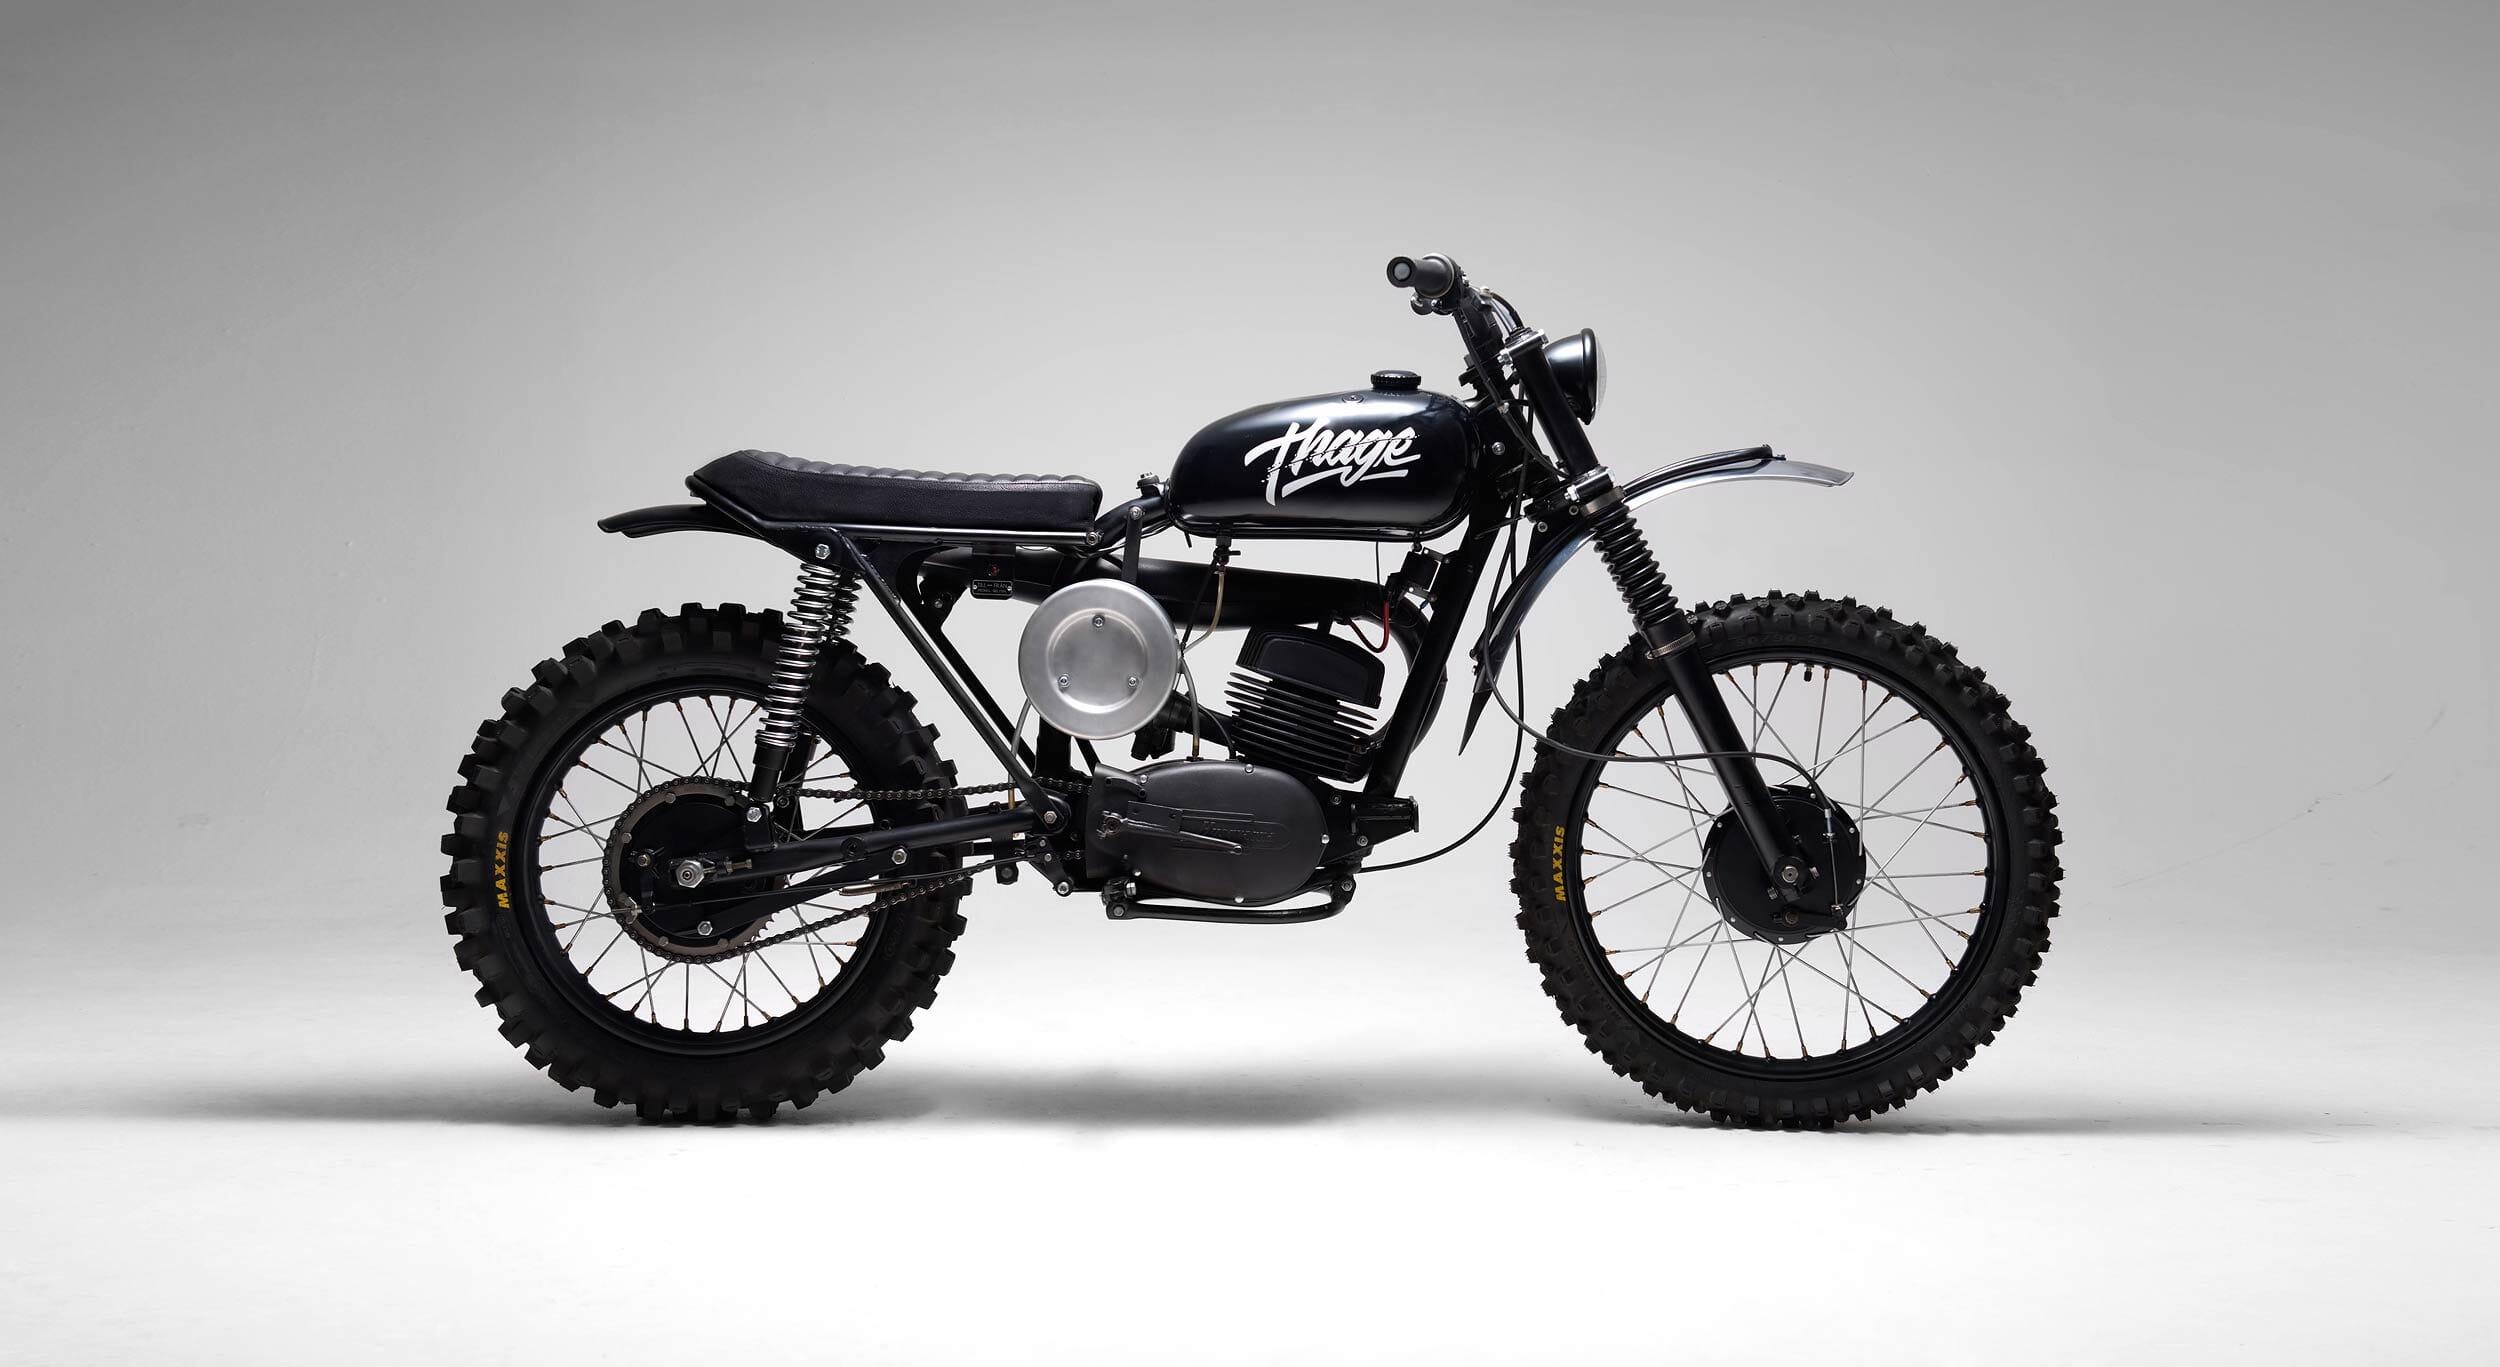 The Husqvarna 256 Thage Motorcycle